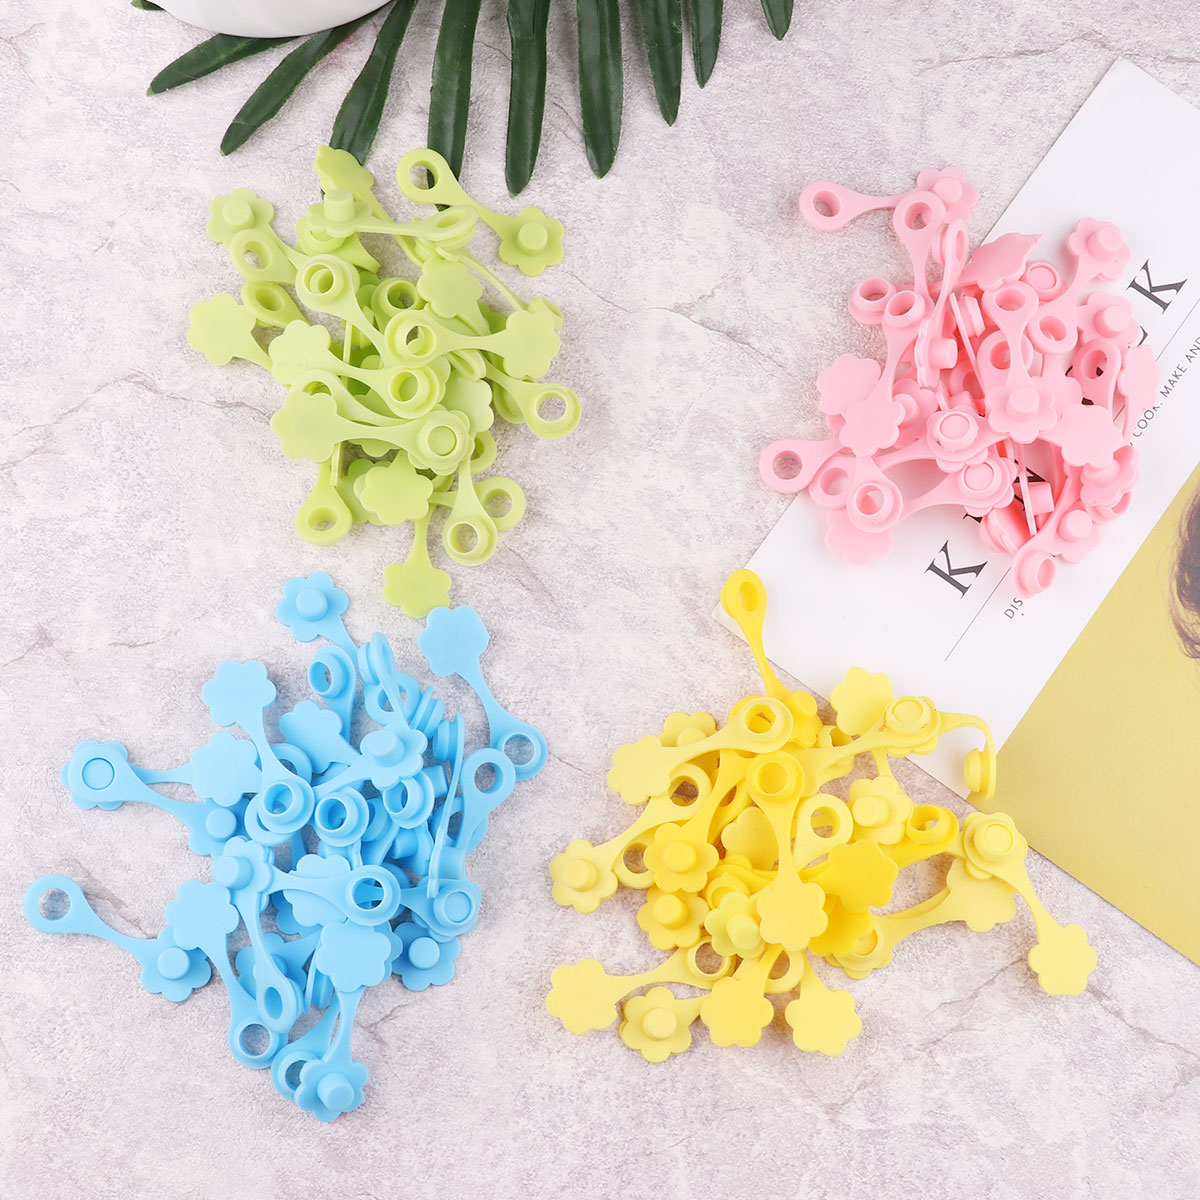 100 tapas de tarros Mason tapas tapones decorativos de silicona en forma de flor tapones 70mm tarros de paja de conservas agujero no derrame tapa tapón